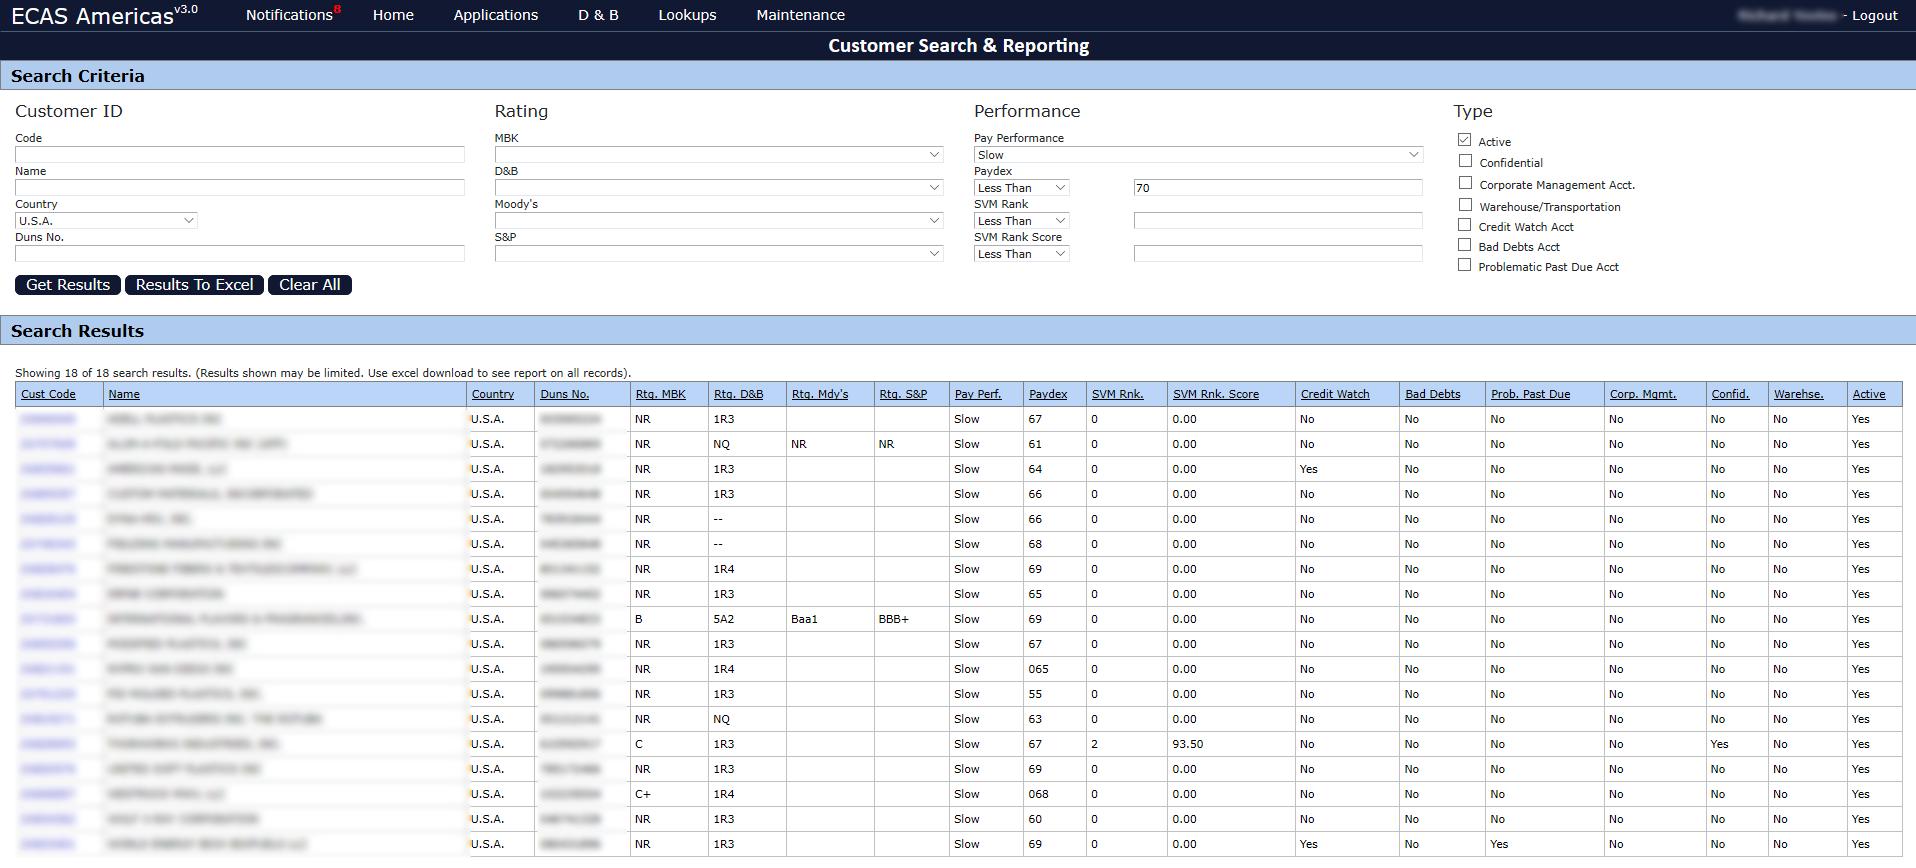 Customer Search & Reporting